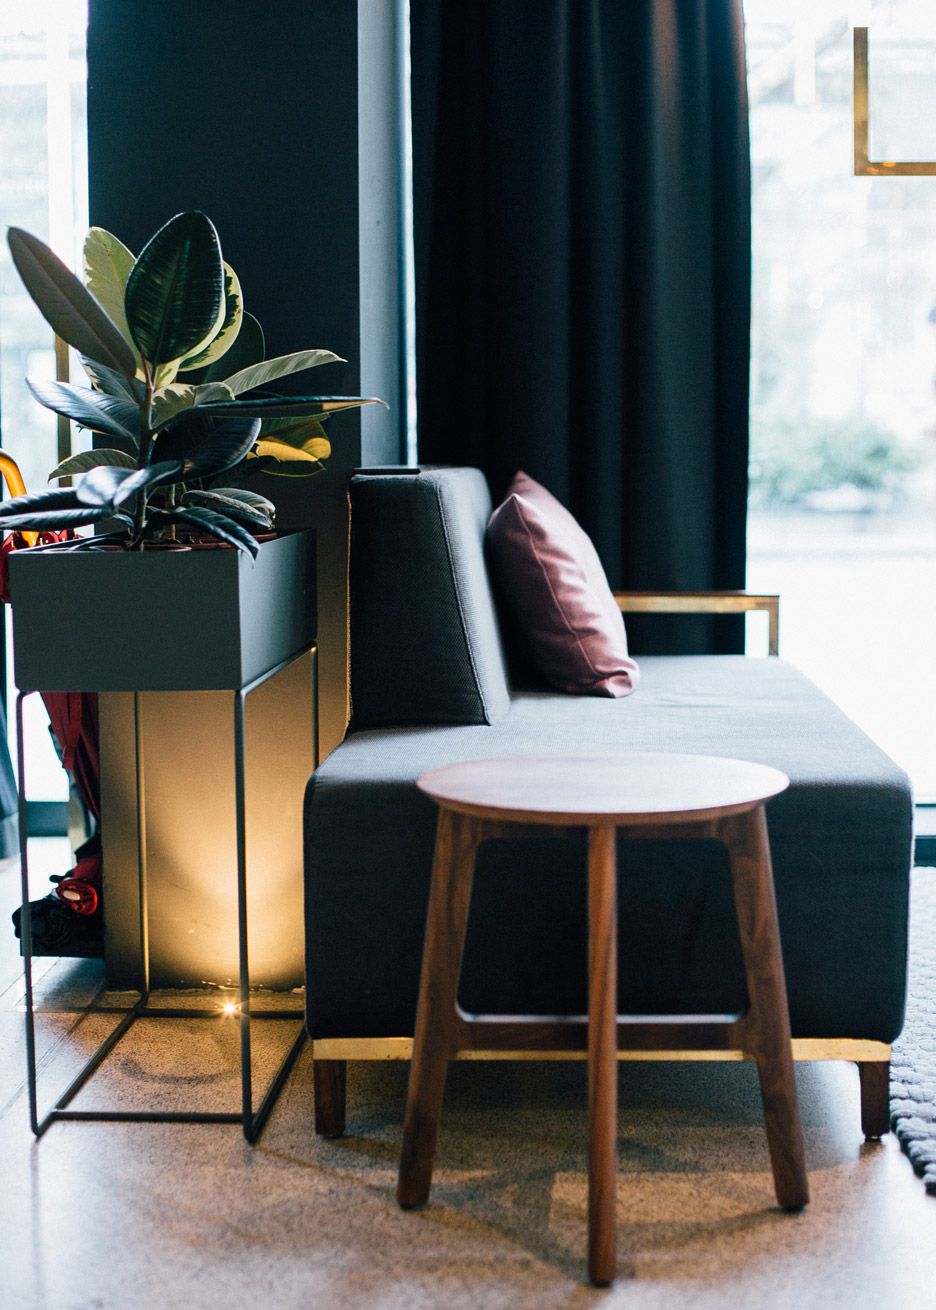 architecture_brass_vein_modern_residence_design_studia_interiors_osnovadesign_osnova_poltava_08